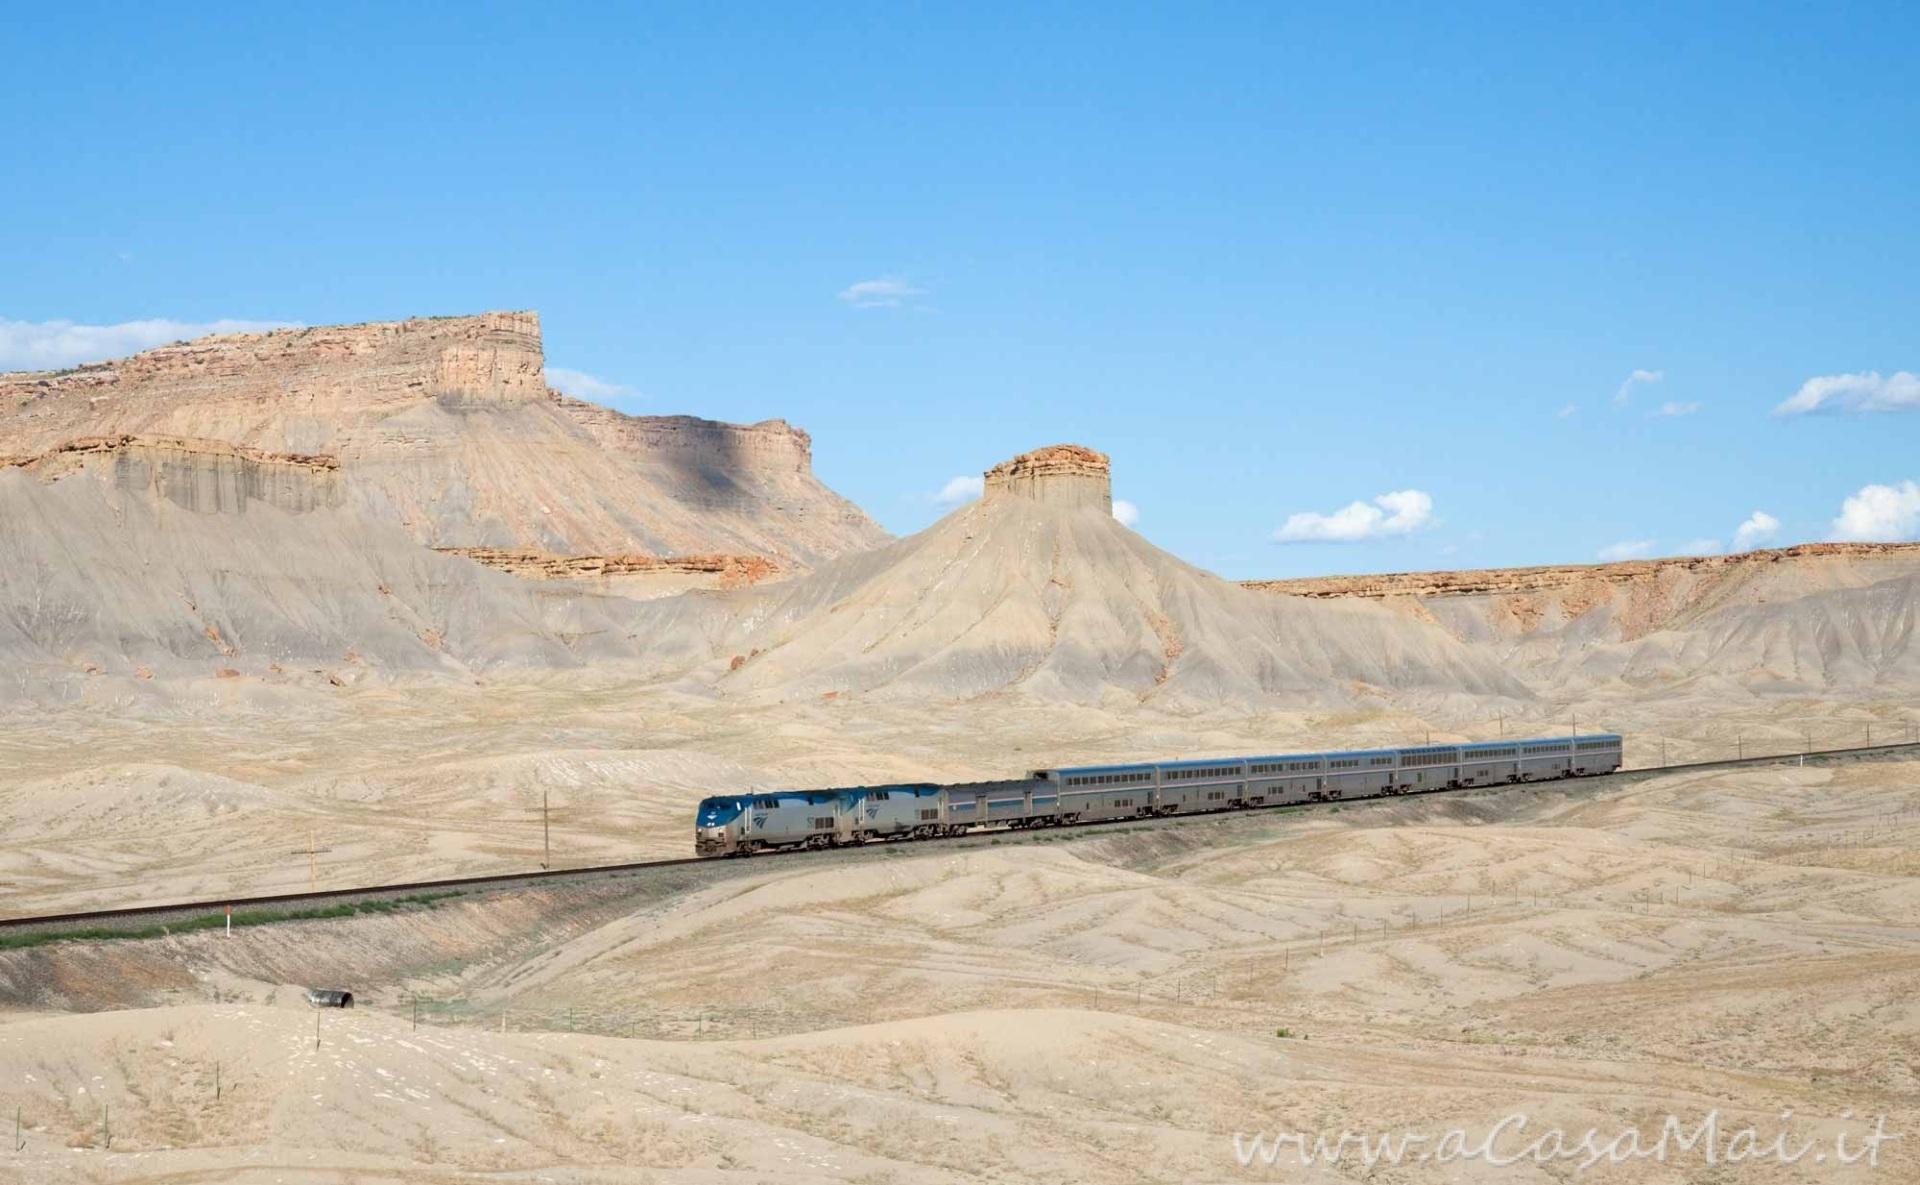 Amtrak - California Zephyr - Green River Floy, Utah